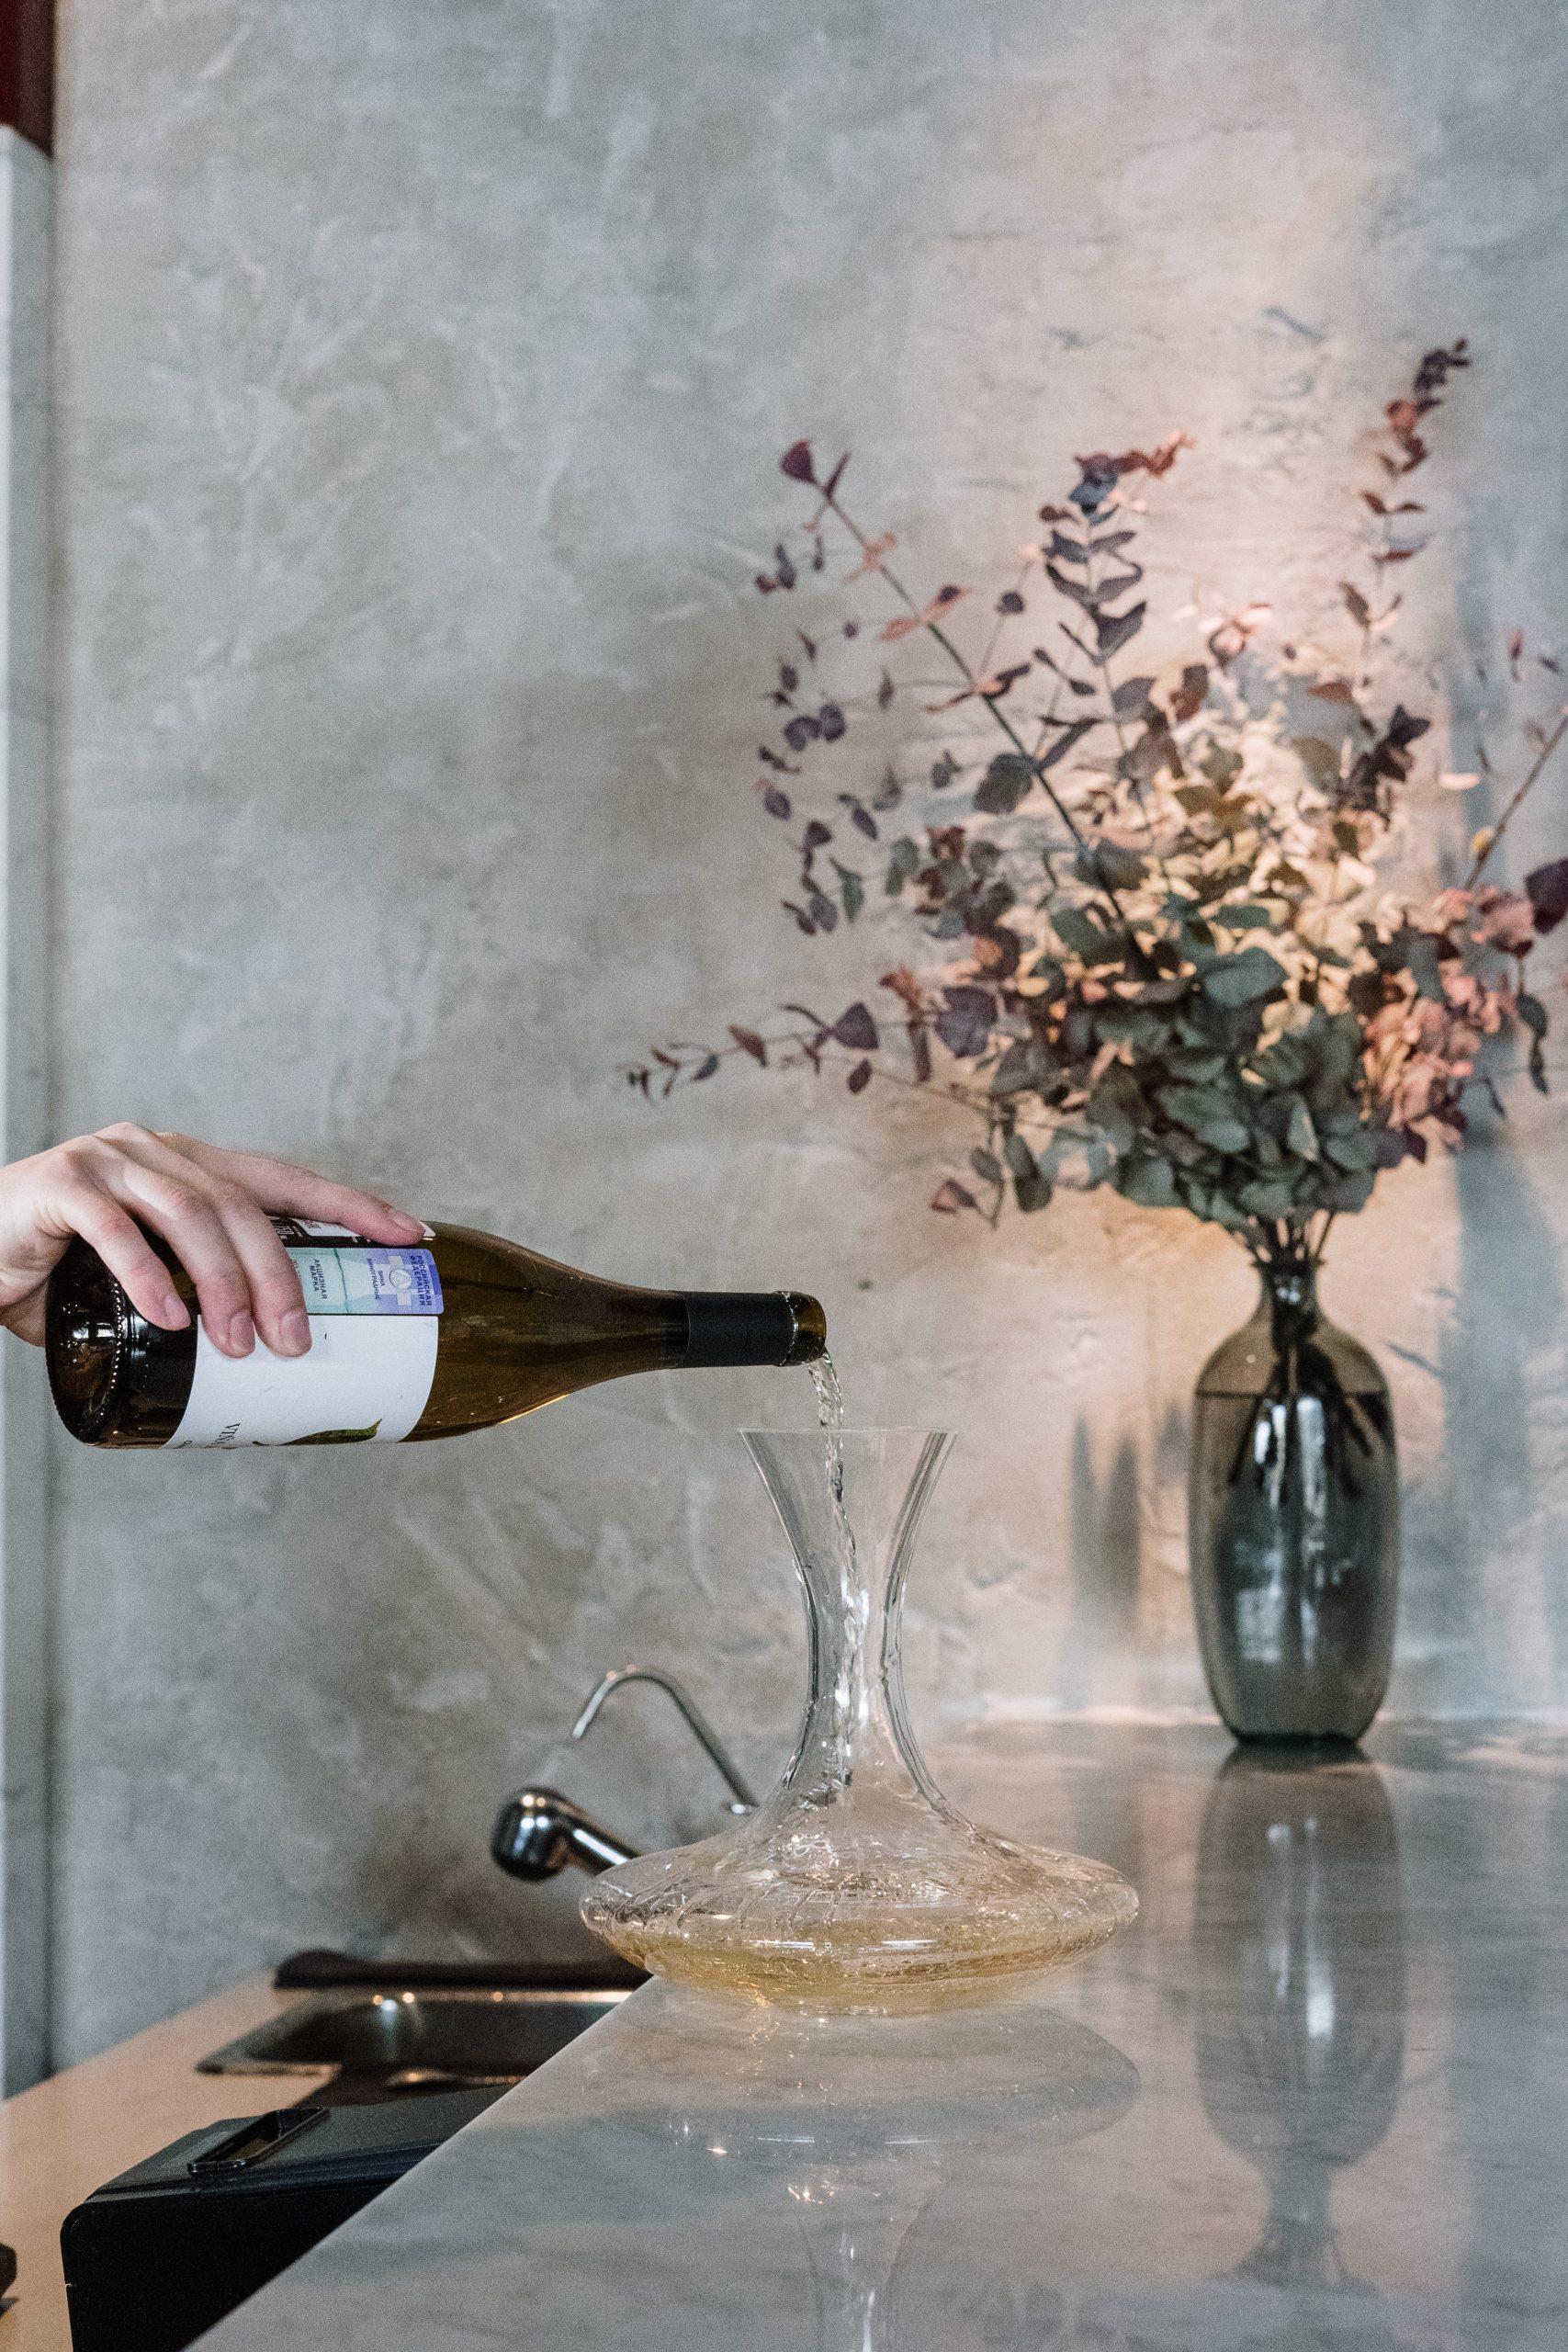 En la imagen, un hombre se sirve una copa de vino. /Foto: Pexels